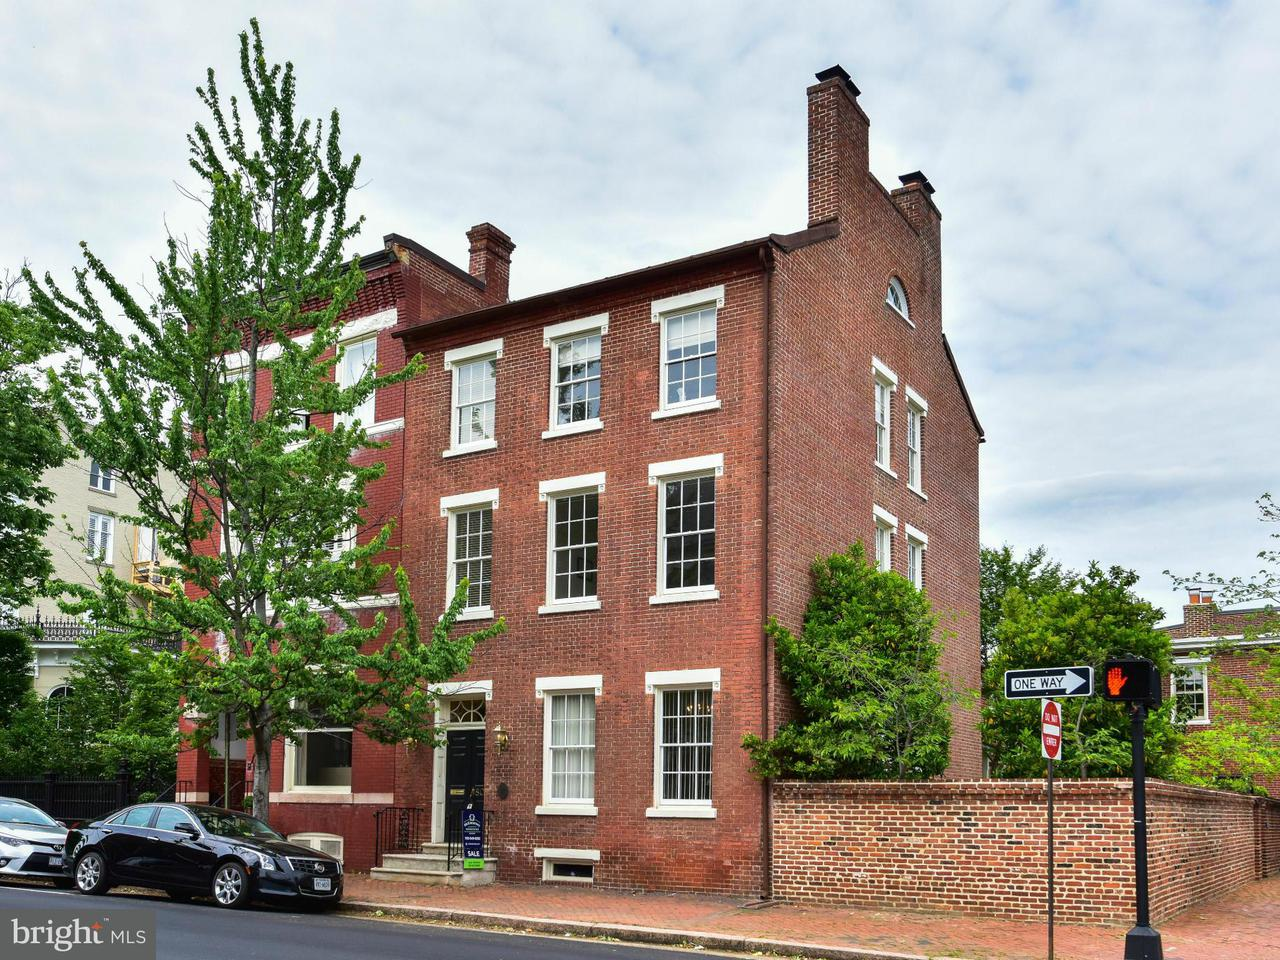 Casa unifamiliar adosada (Townhouse) por un Venta en 803 Prince Street 803 Prince Street Alexandria, Virginia 22314 Estados Unidos